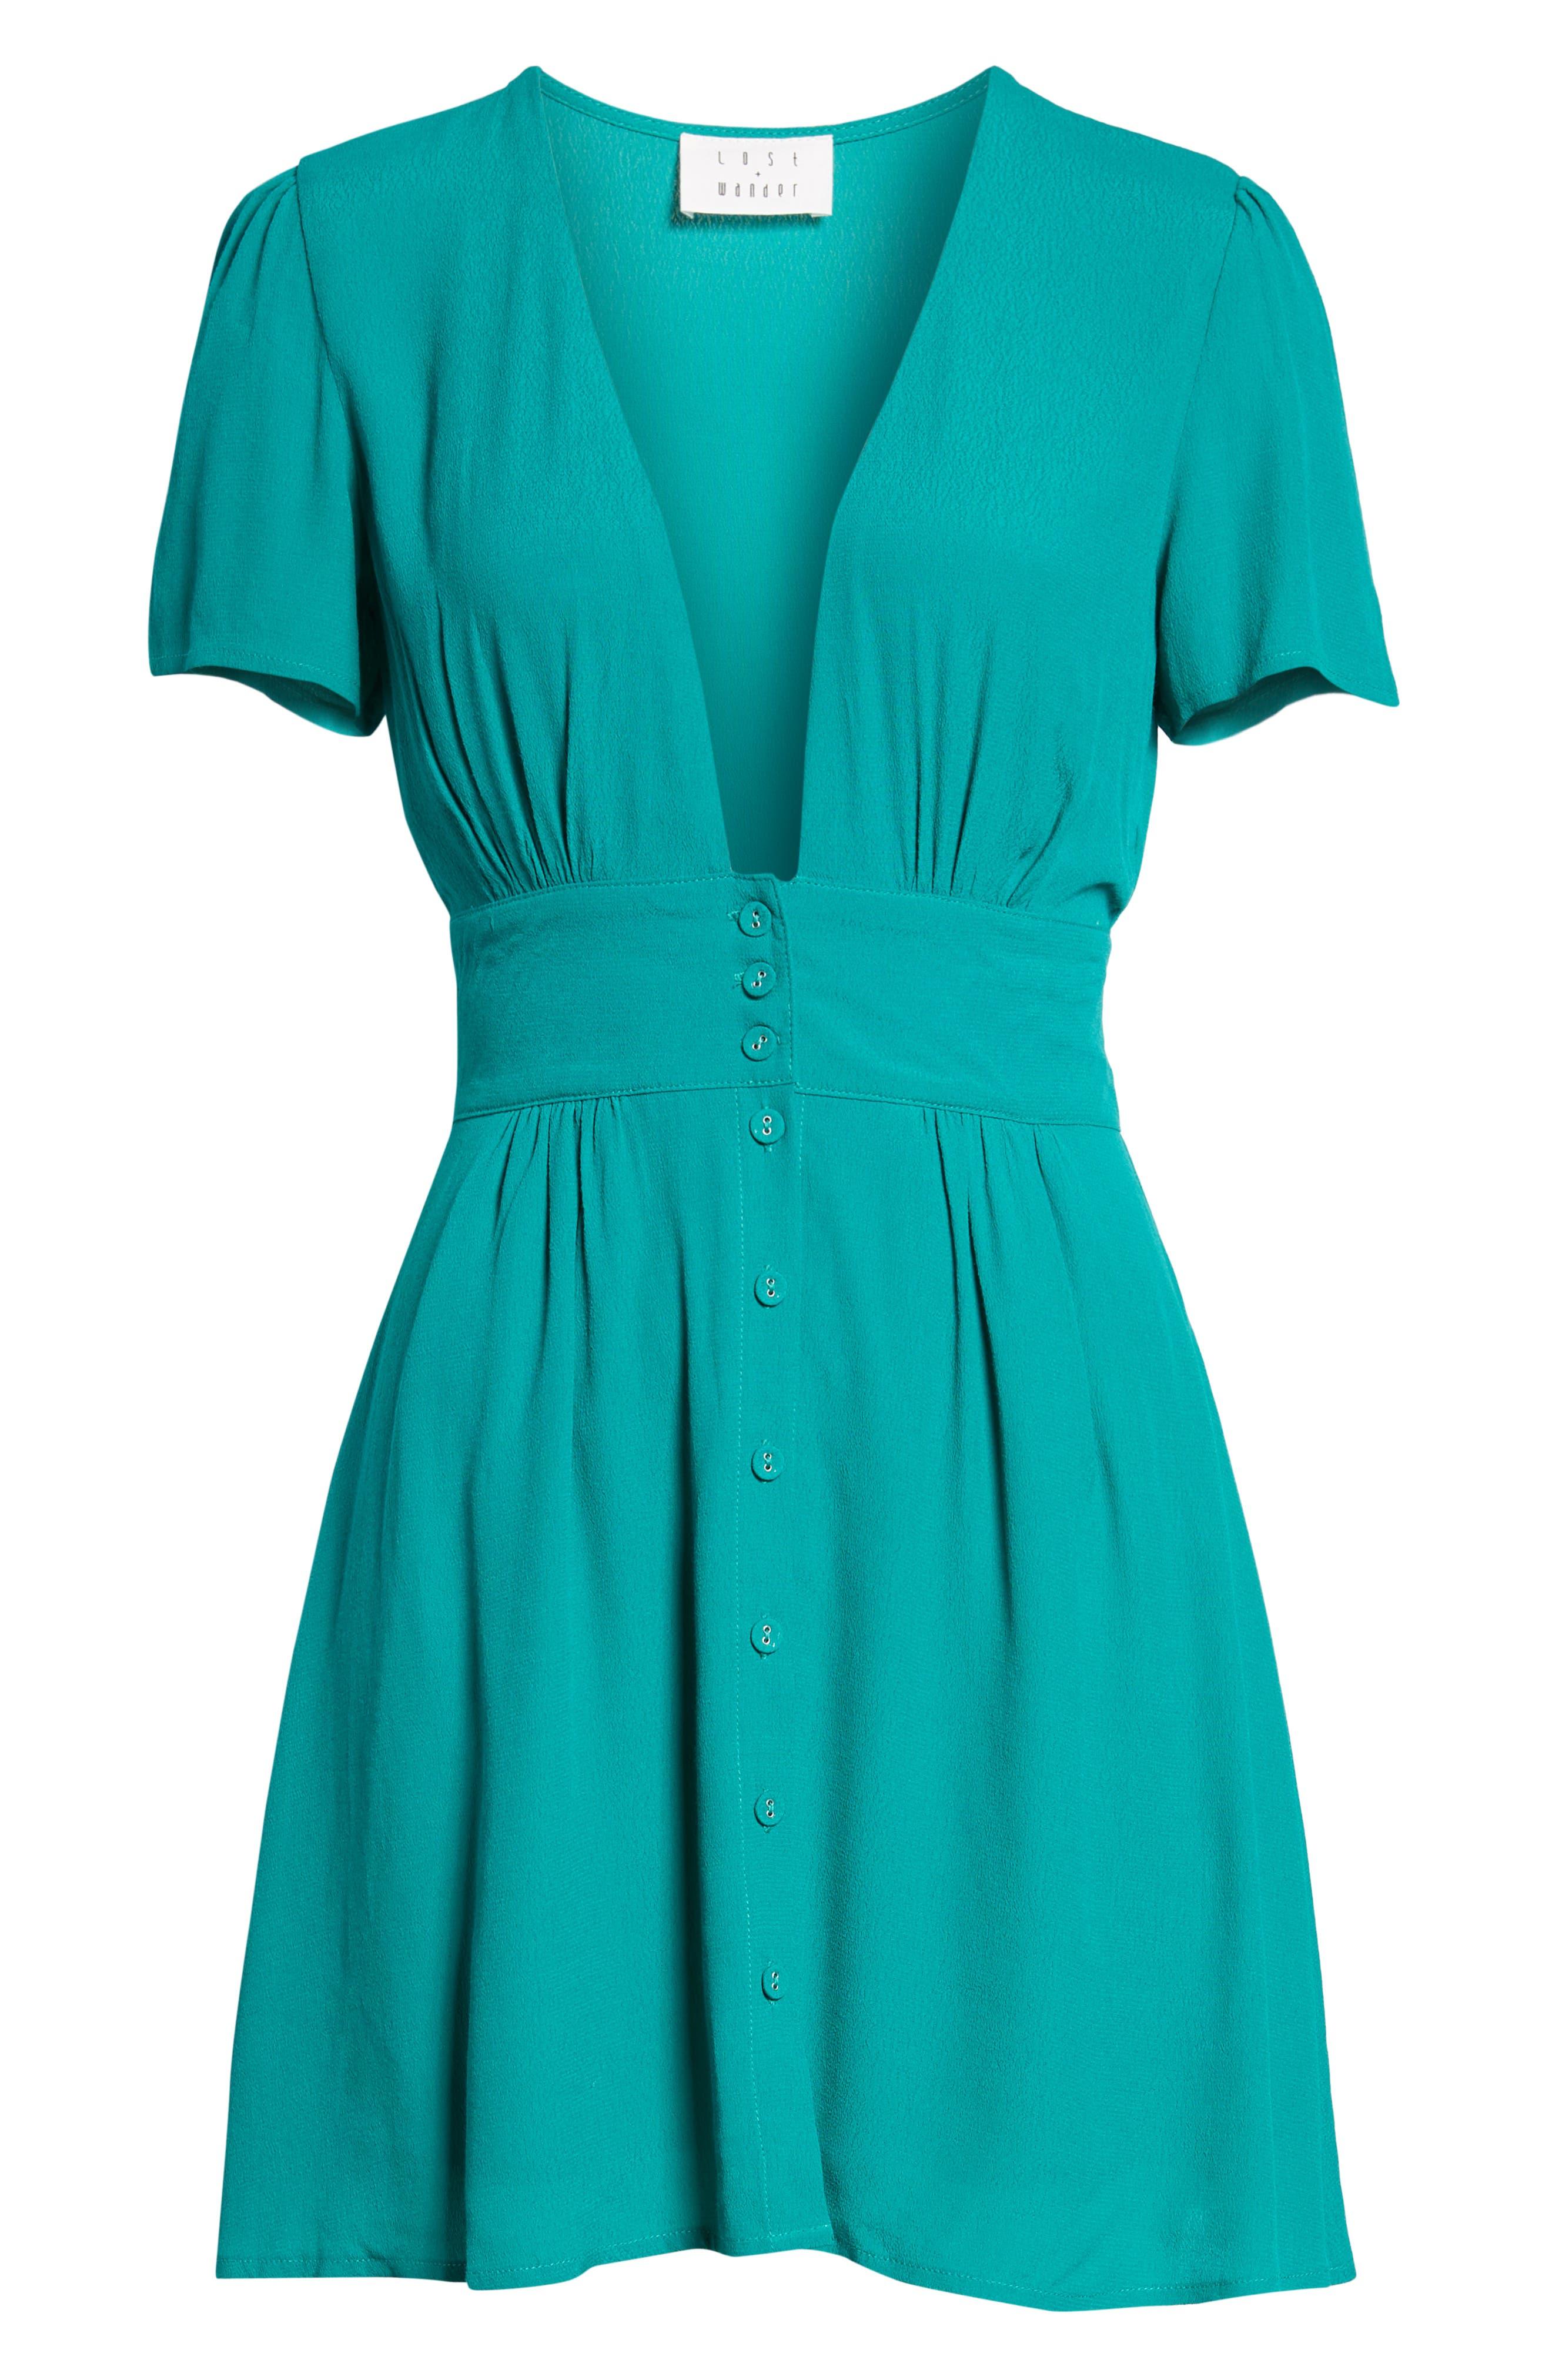 Verdera Plunging Minidress,                             Alternate thumbnail 8, color,                             Green